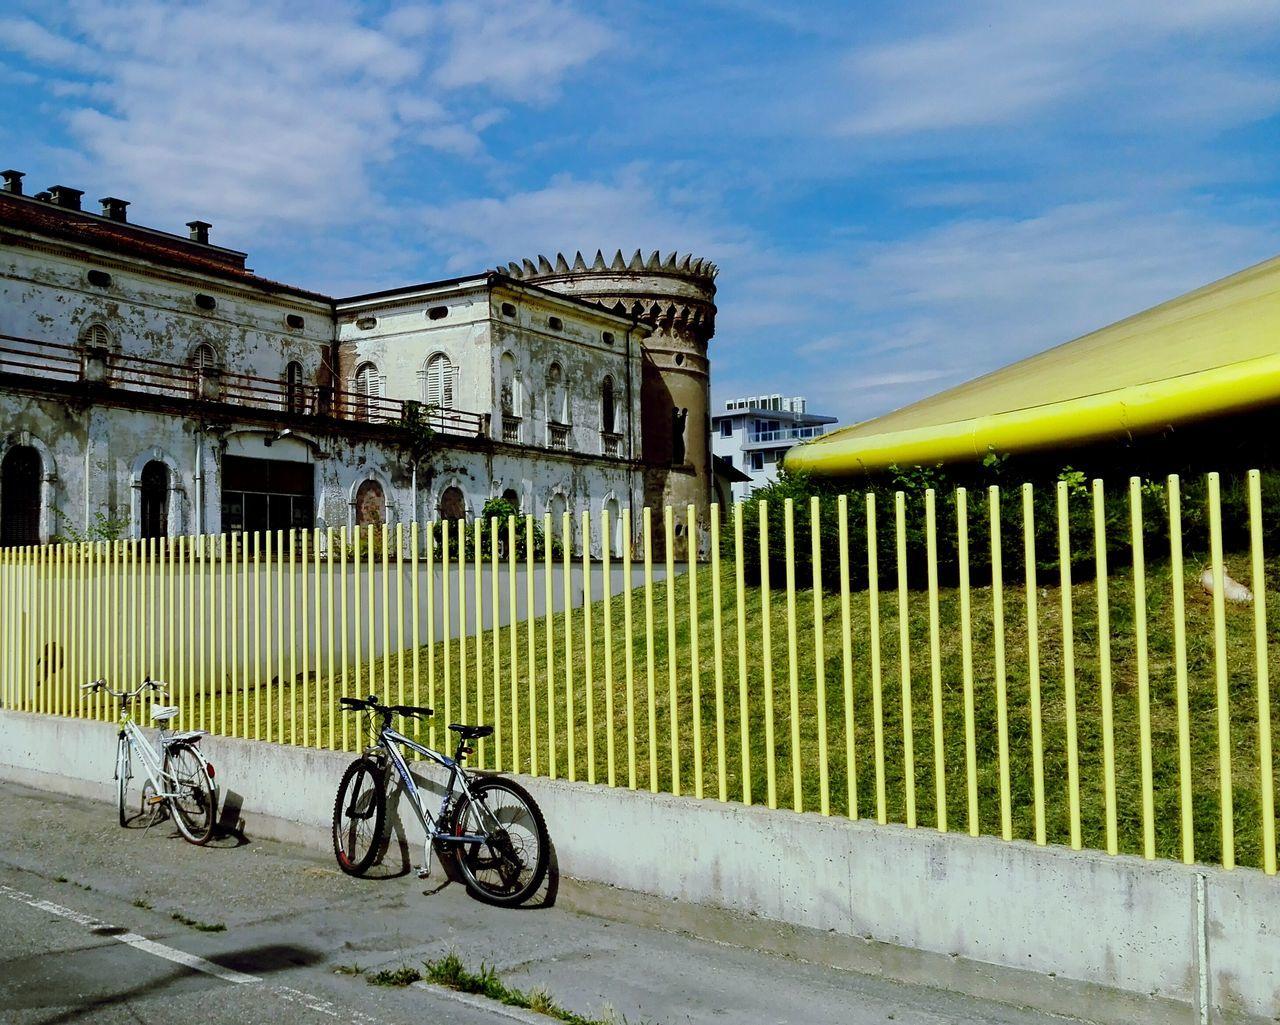 Yellow Fence Colors Taking Photos Architecture Architettura Abandoned Abandoned Places Abandoned Buildings Bikes Vanishing Point Punto Di Fuga Geometric Shapes Cityscapes EyeEm Diversity